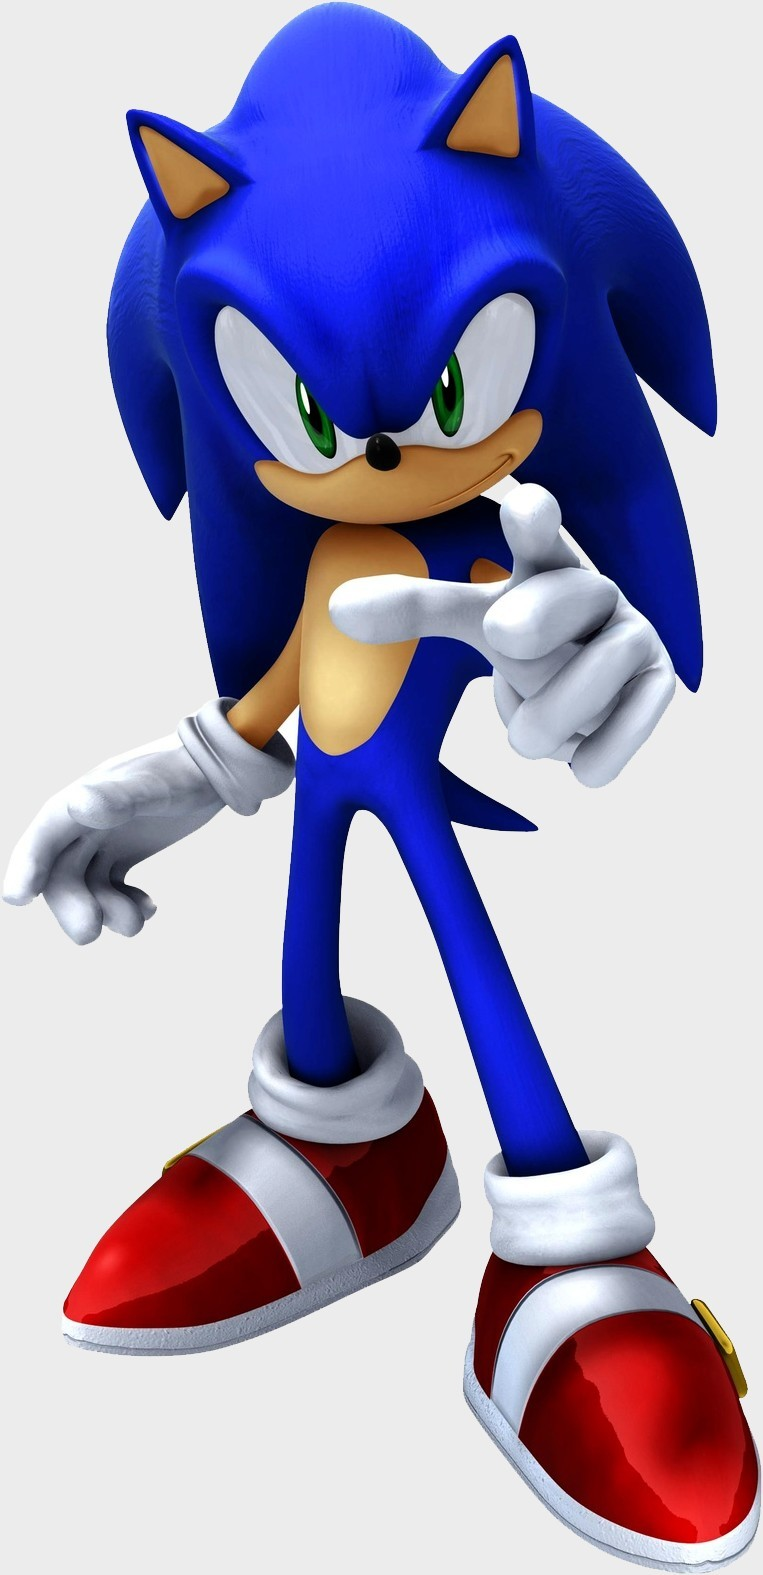 Little History on Sonic the Hedgehog ~ TSKSOFT